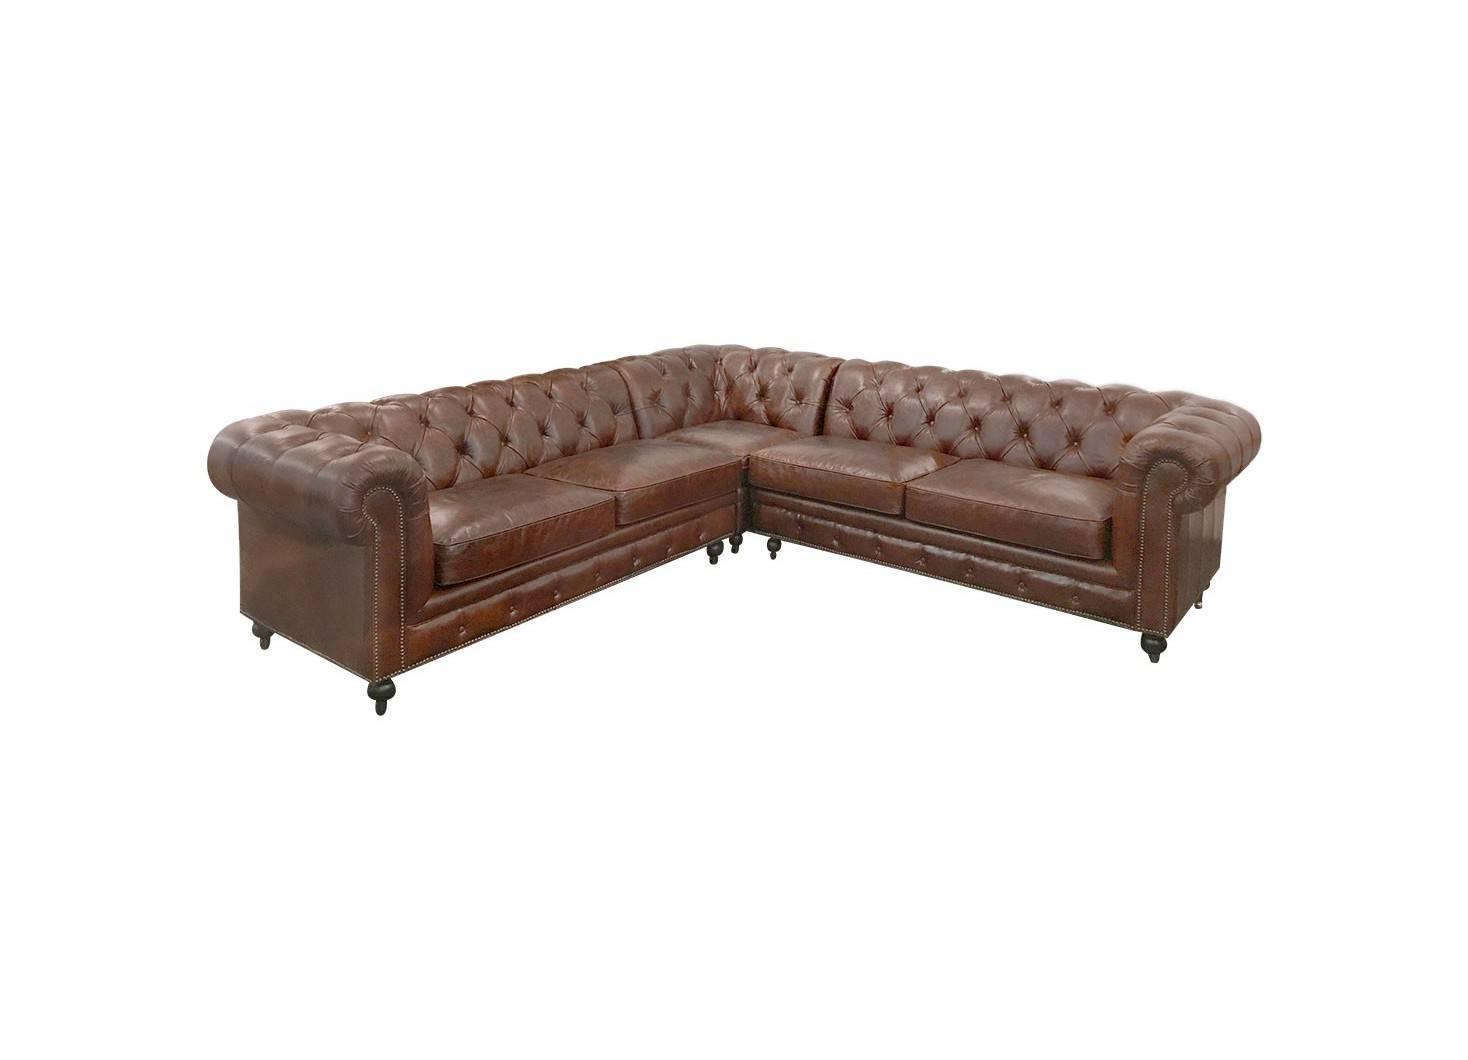 Canapé d'angle cuir Chesterfield avec roulettes - Marron cigare